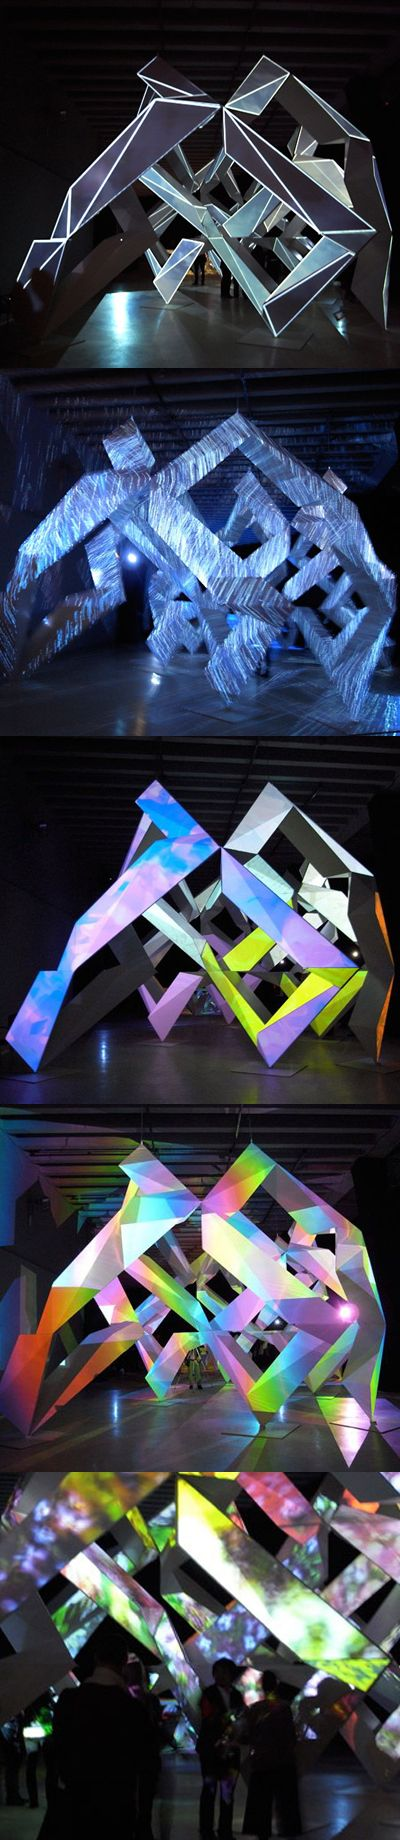 Japanese artist Kyota Takahashi and architect Akihisa Hirata collaborated on Prism Liquid, Canon's Neoreal installation